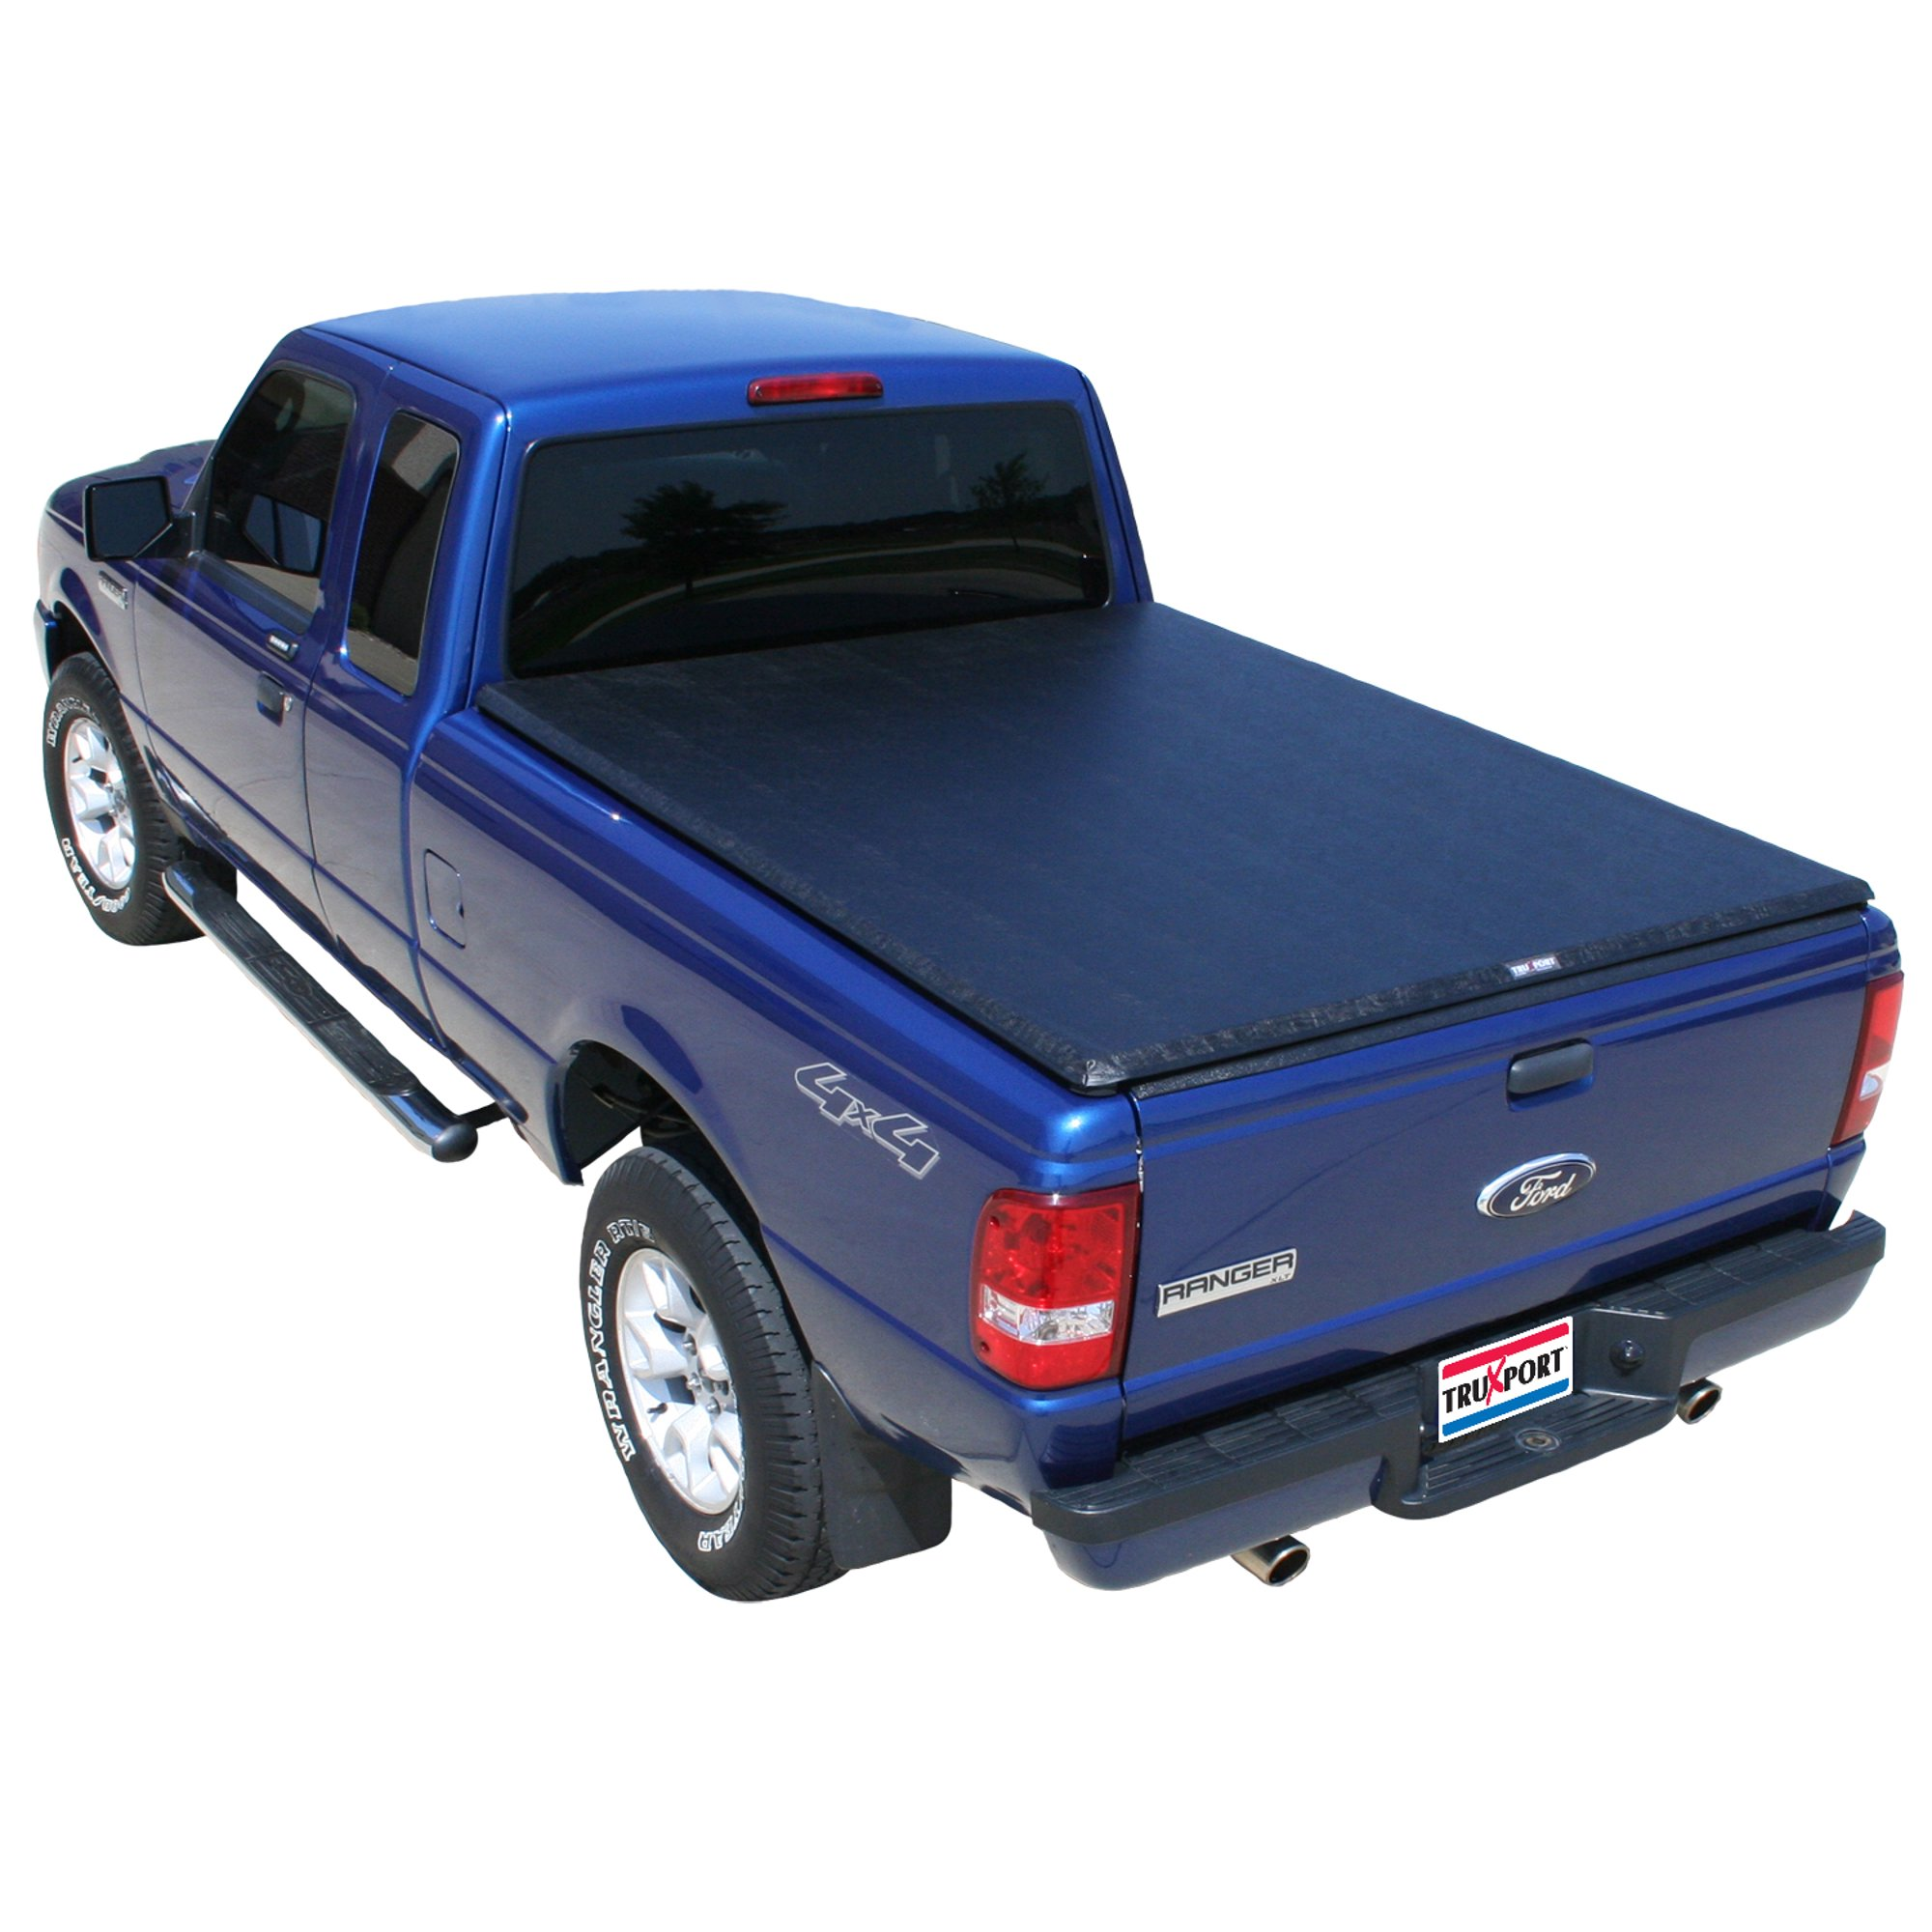 Truxedo 250601 Tonneau Cover Truxport R Soft Roll Up Velcro